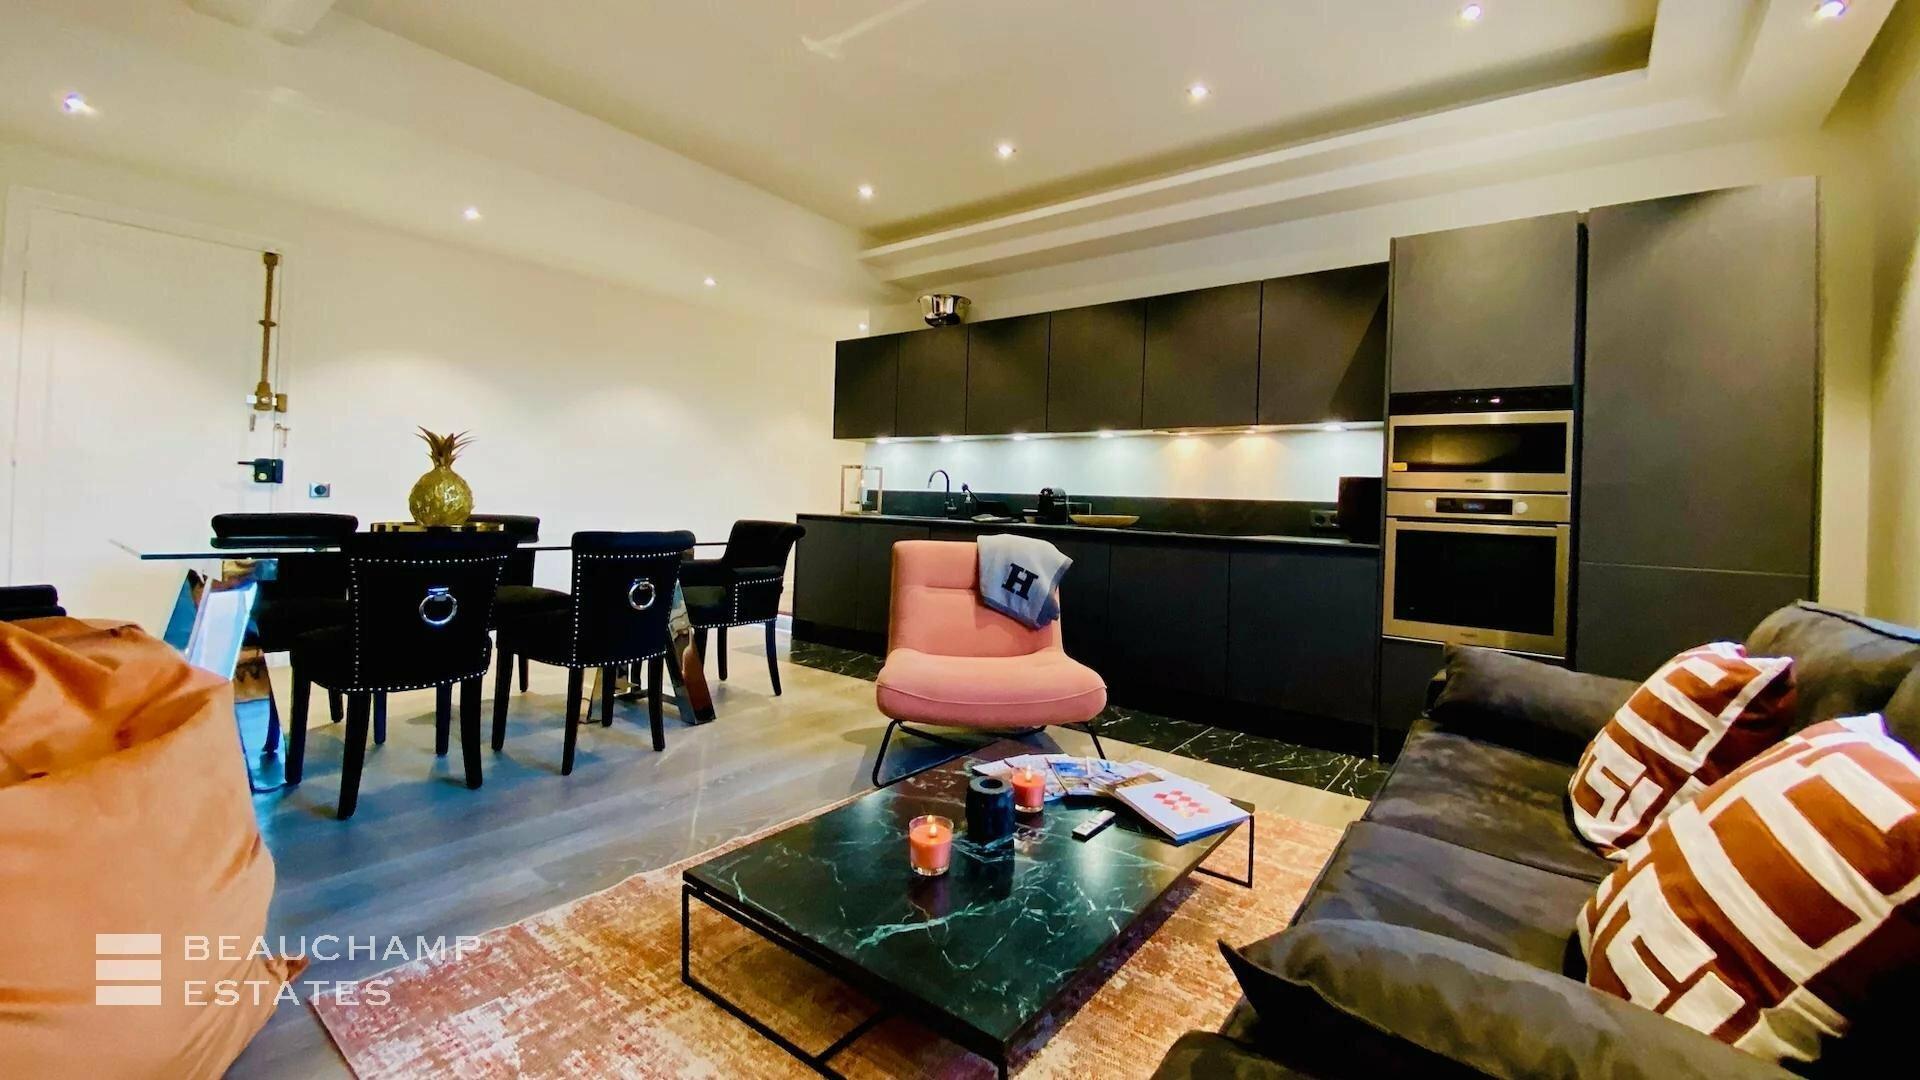 Appartamento a Cannes, Provenza-Alpi-Costa Azzurra, Francia 1 - 11409764